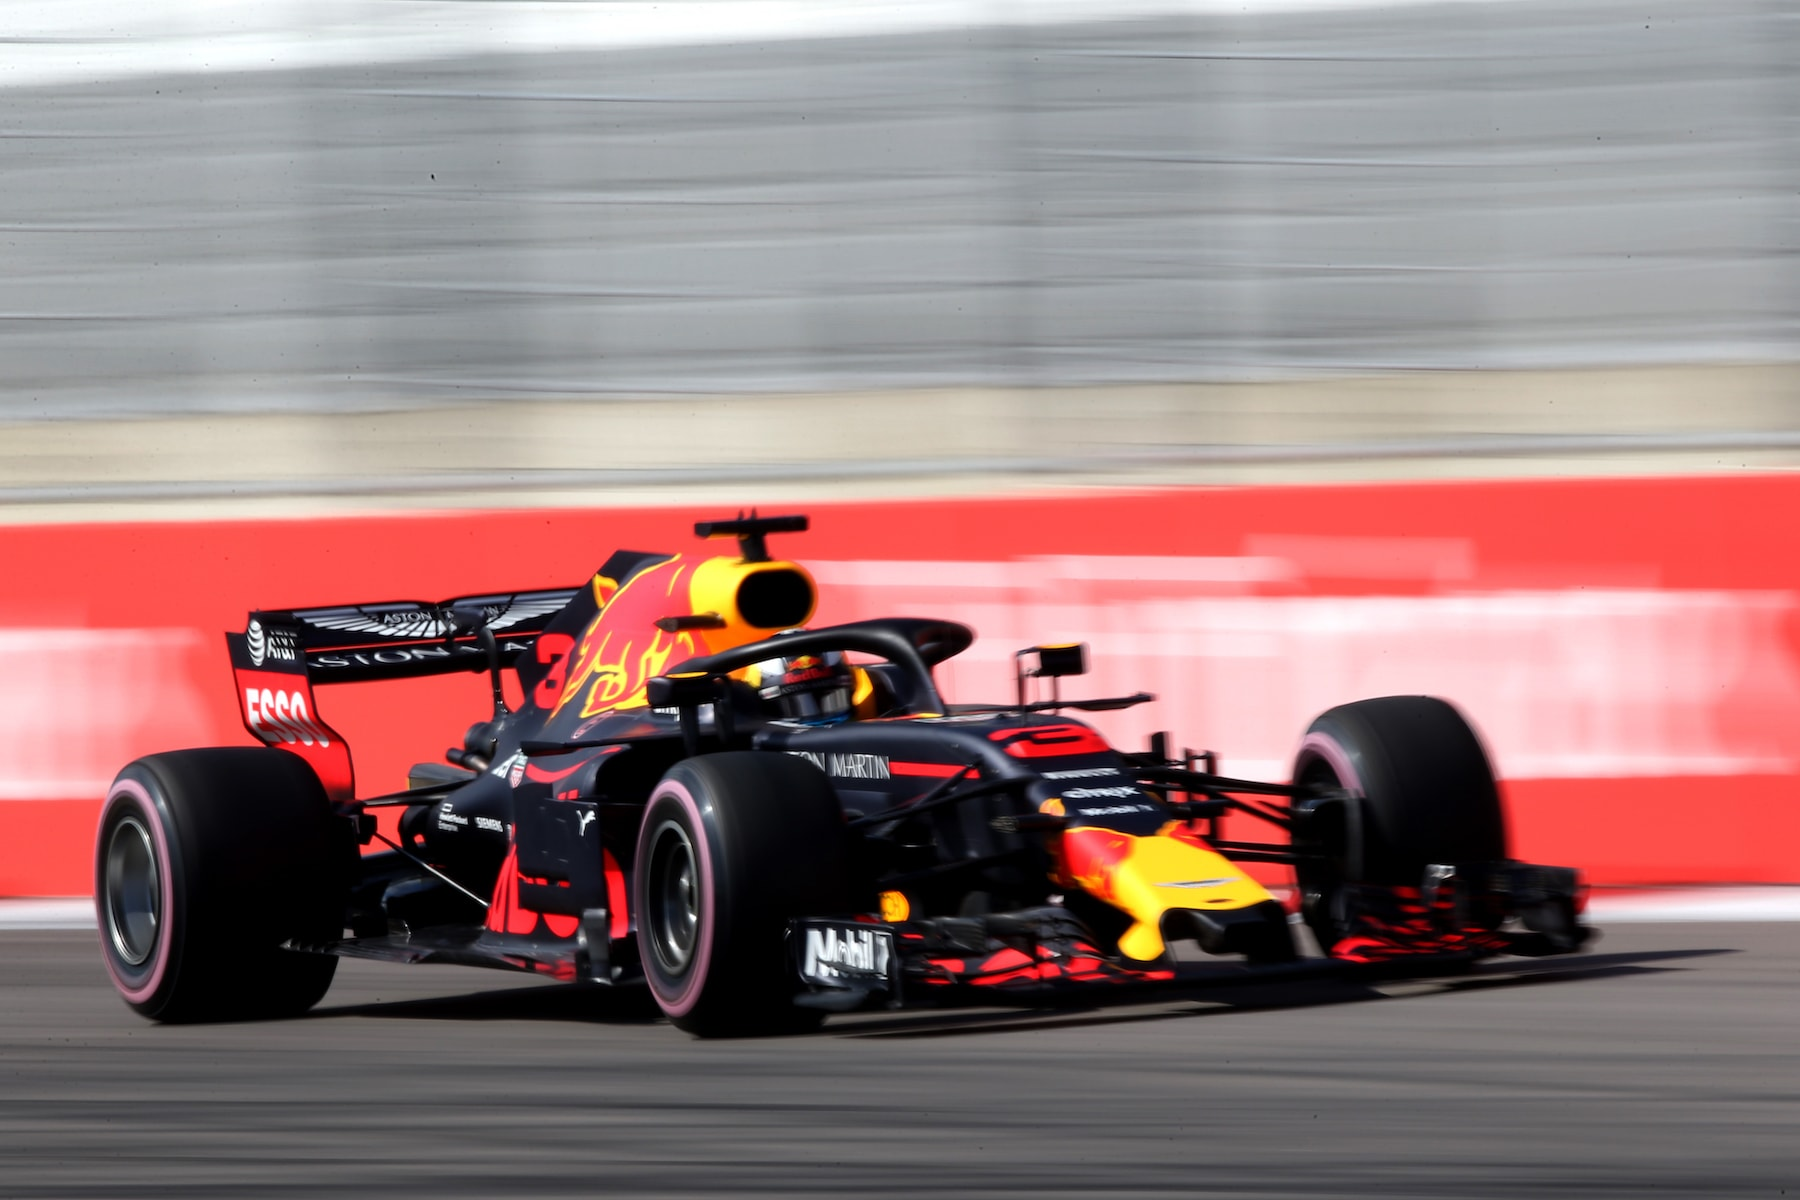 2018 Daniel Ricciardo | Red Bull RB14 | 2018 Russian GP Q1 1 Photo by Charles Coates copy.jpg